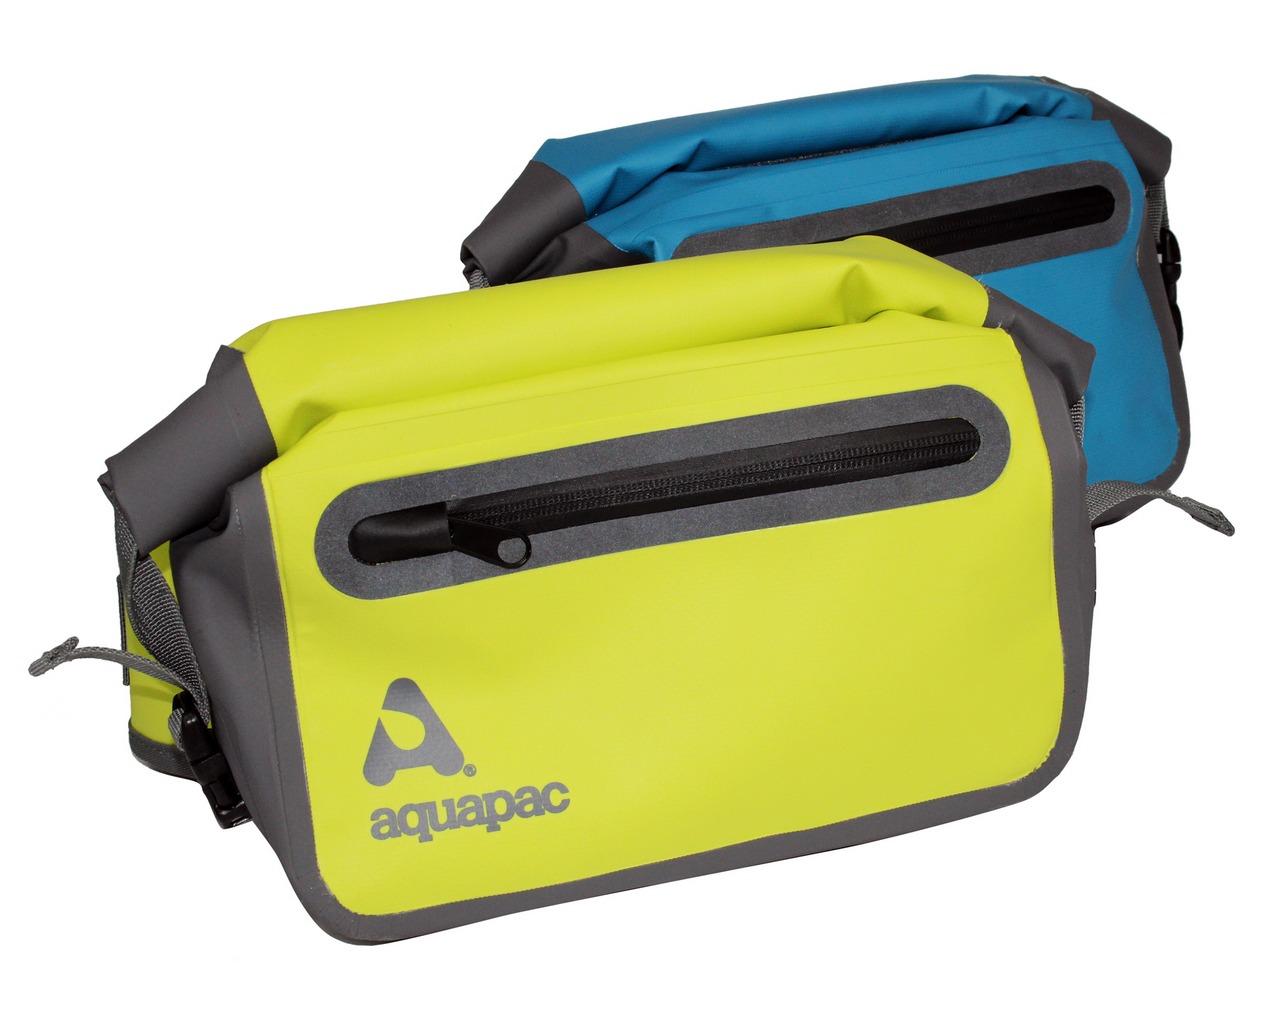 Водонепроницаемый чехол для документов - Aquapac 821. Aquapac - №1 в мире водонепроницаемых чехлов и сумок. Фото 3